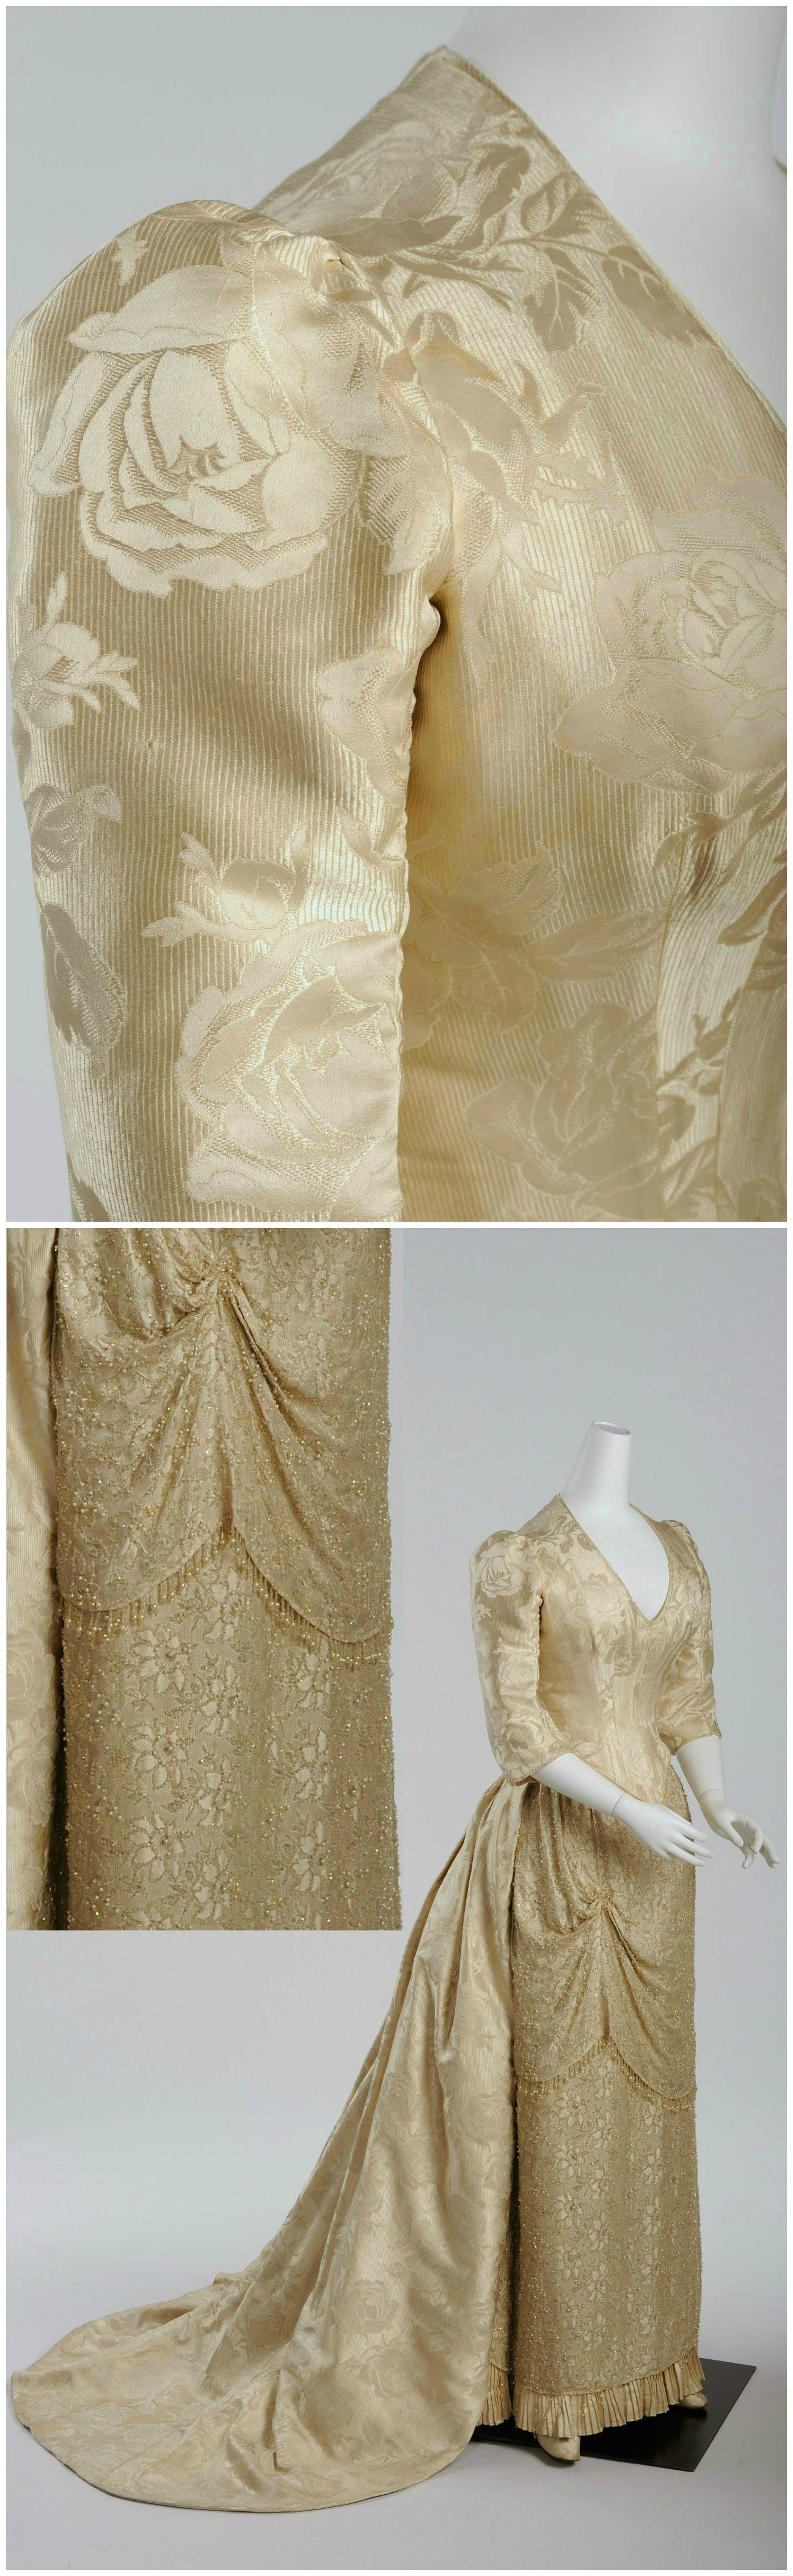 dress of silver silk damask with rose pattern,g. & e